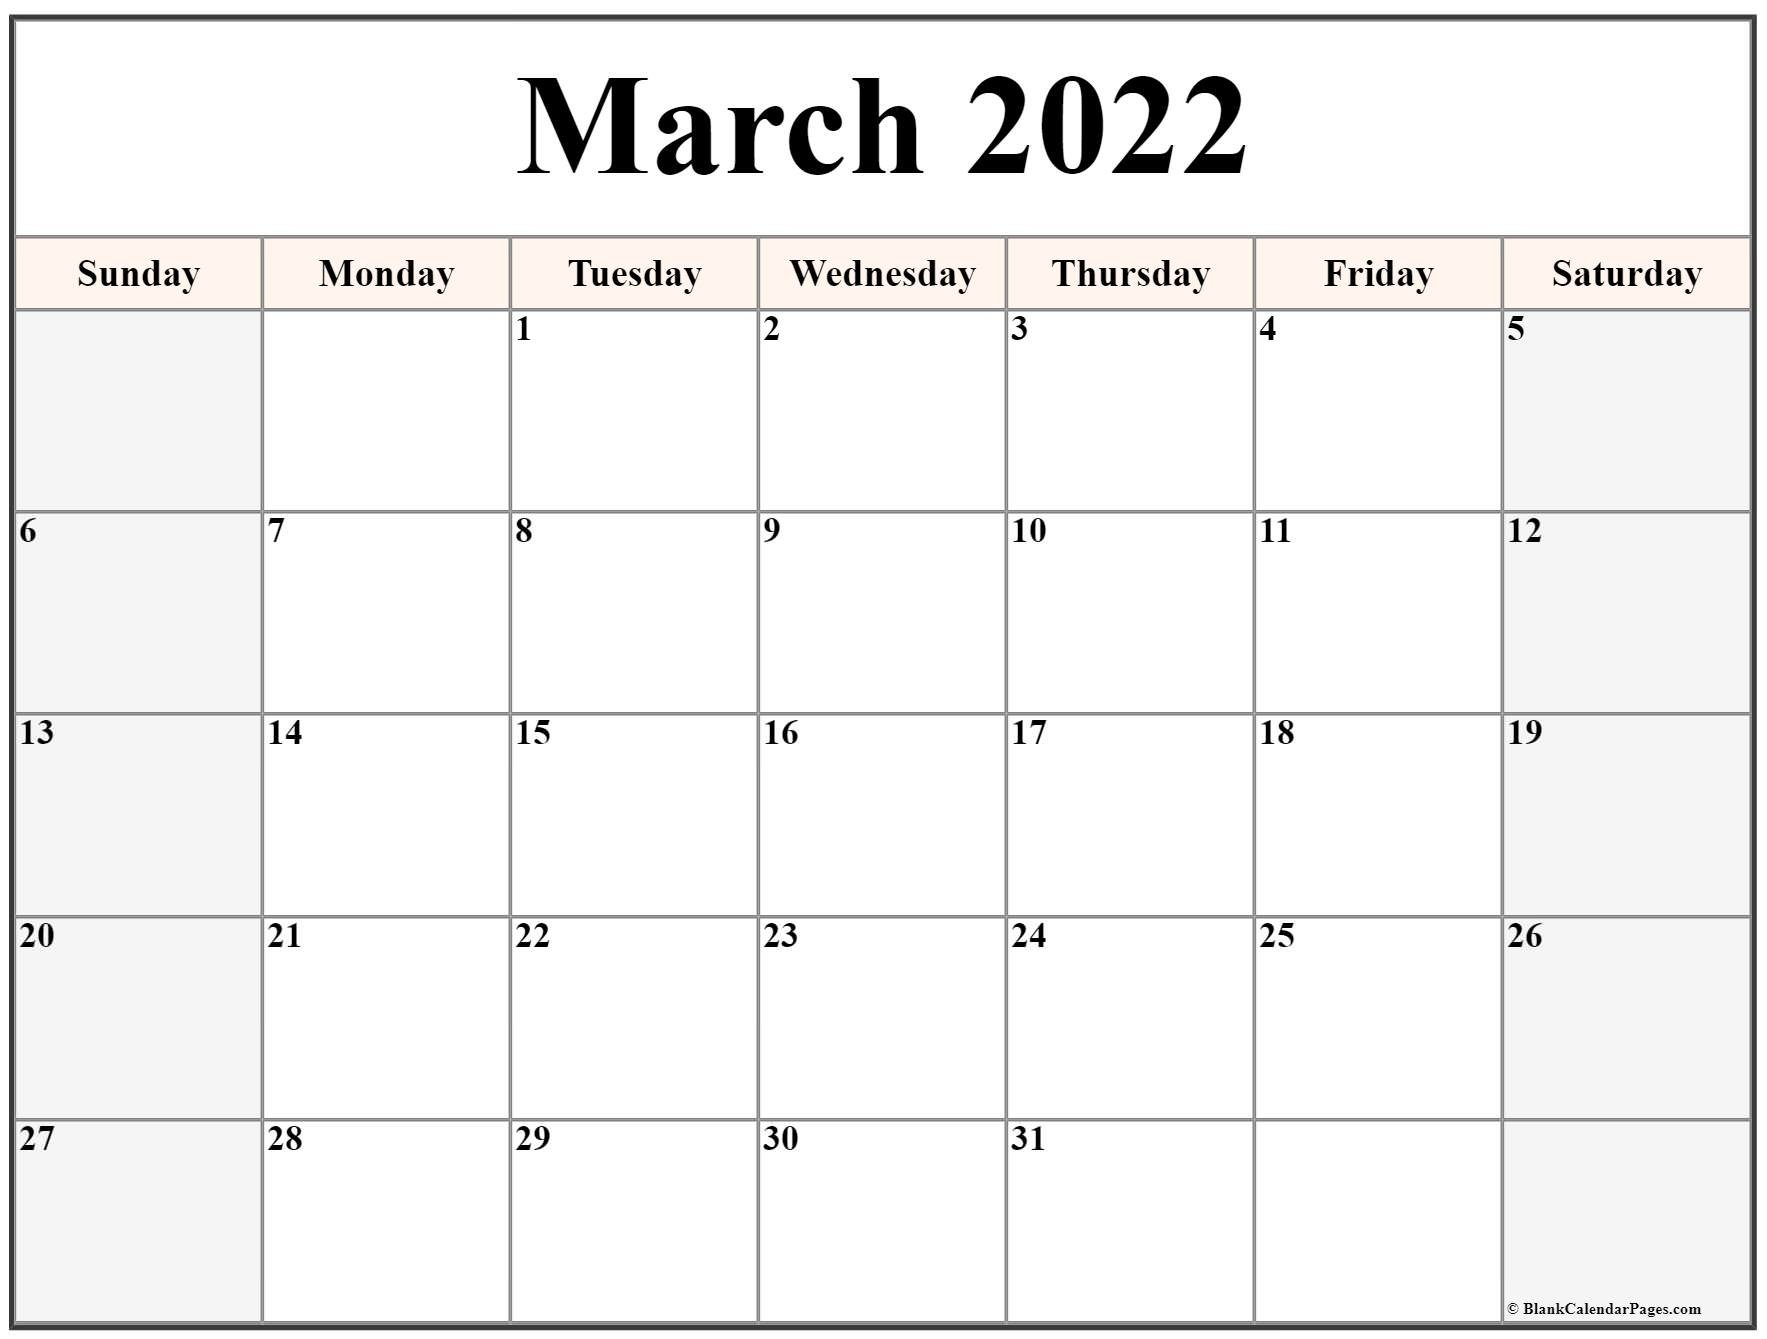 March 2022 Calendar | Free Printable Calendar Templates pertaining to March April 2022 Printable Calendar